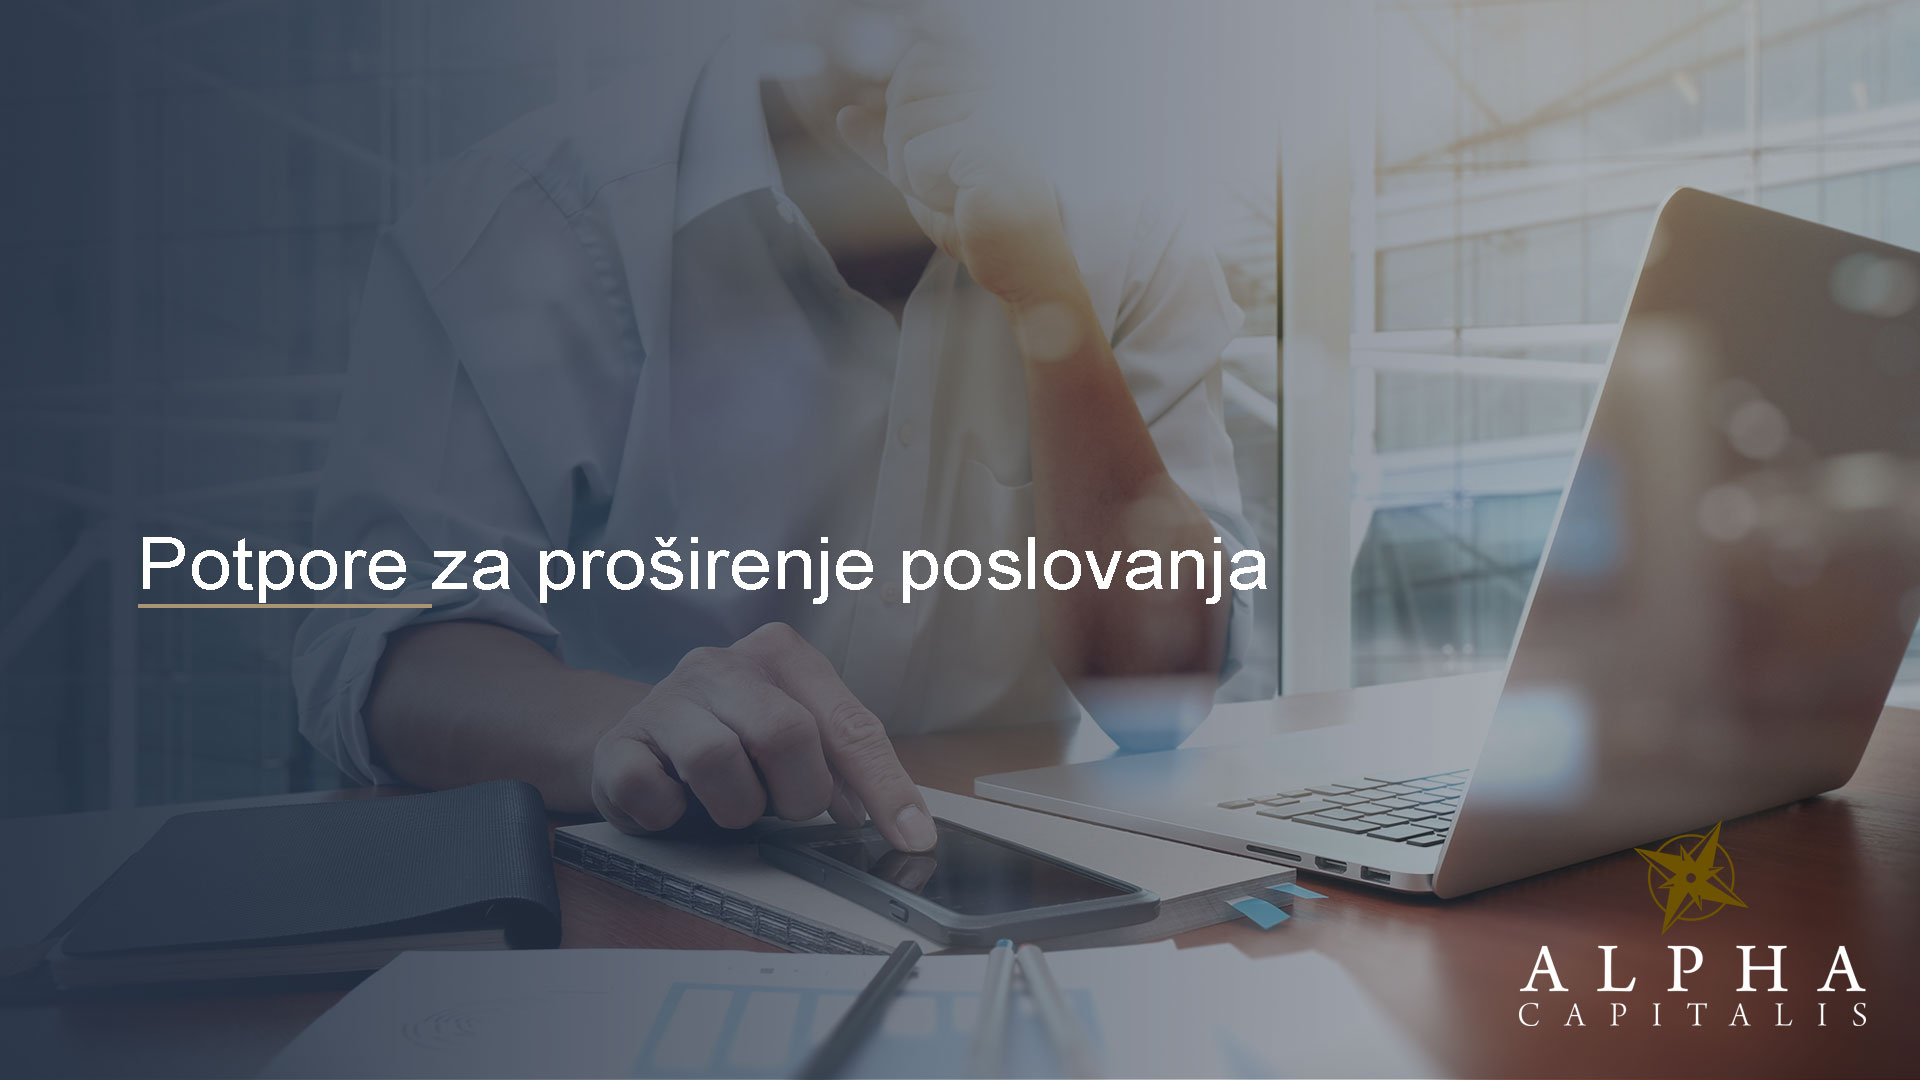 Alpha-Capitalis_novosti_Potpore-za-proširenje-poslovanja